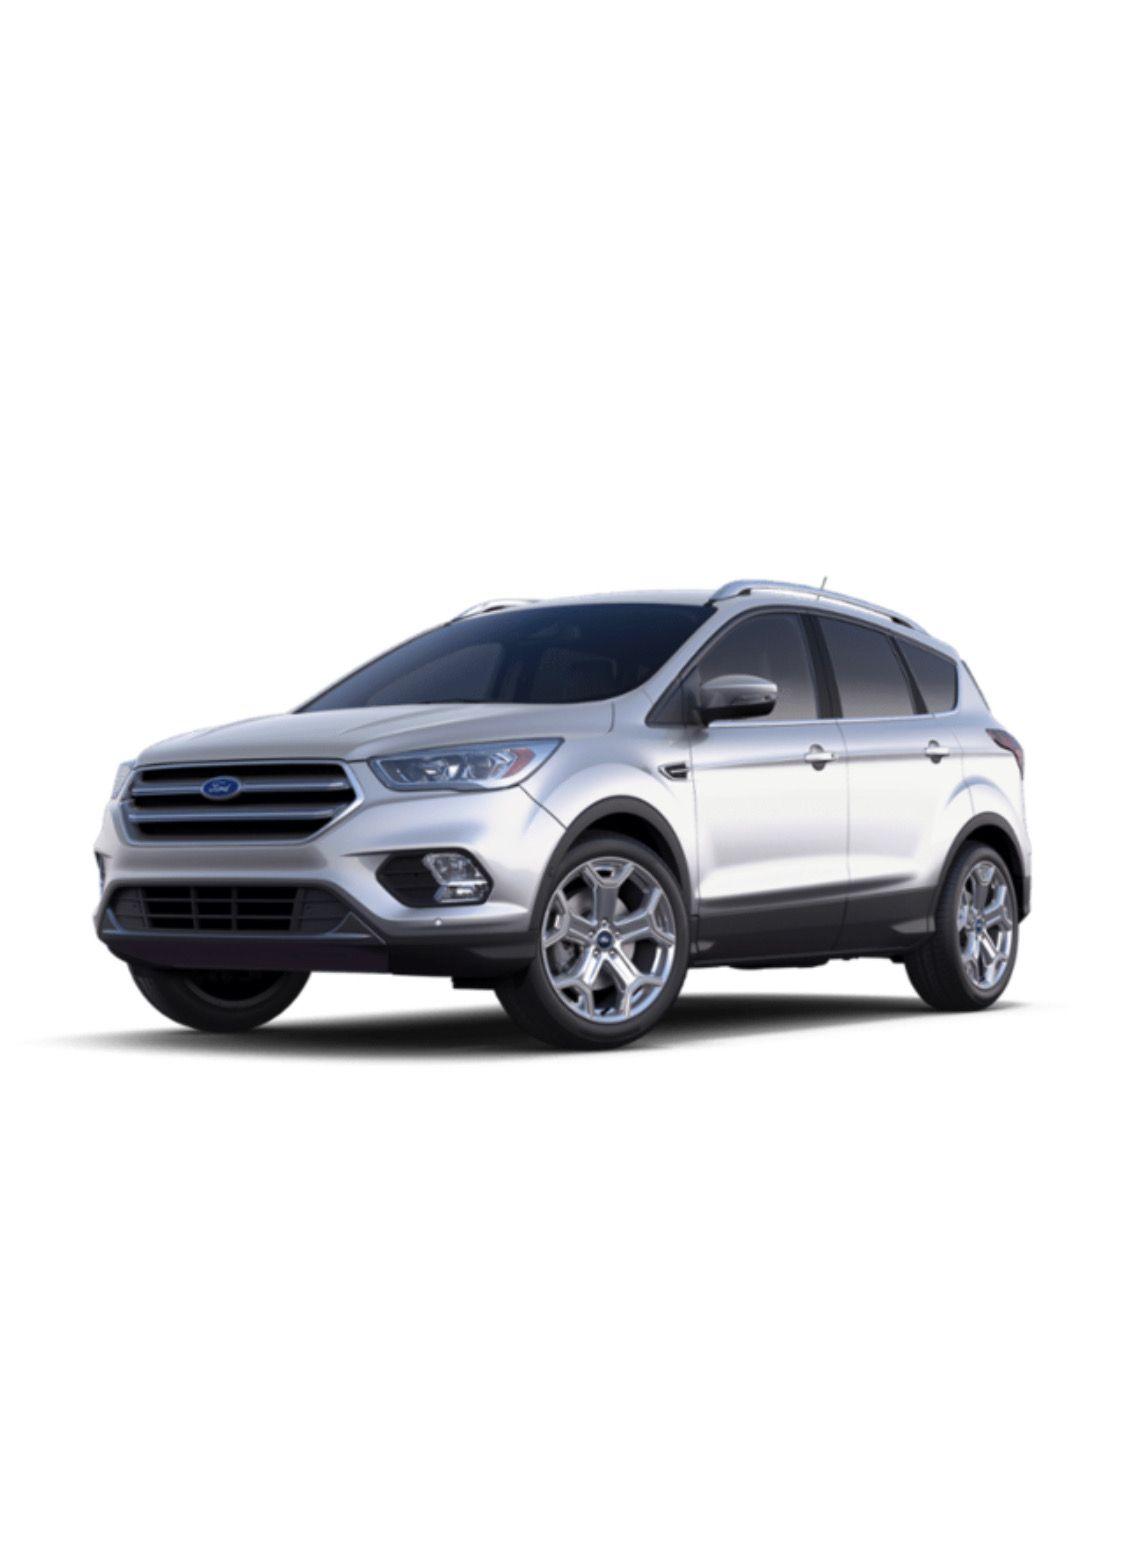 2019 Ford Escape Titanium White Platinum In 2020 Ford Escape 2019 Ford Titanium White